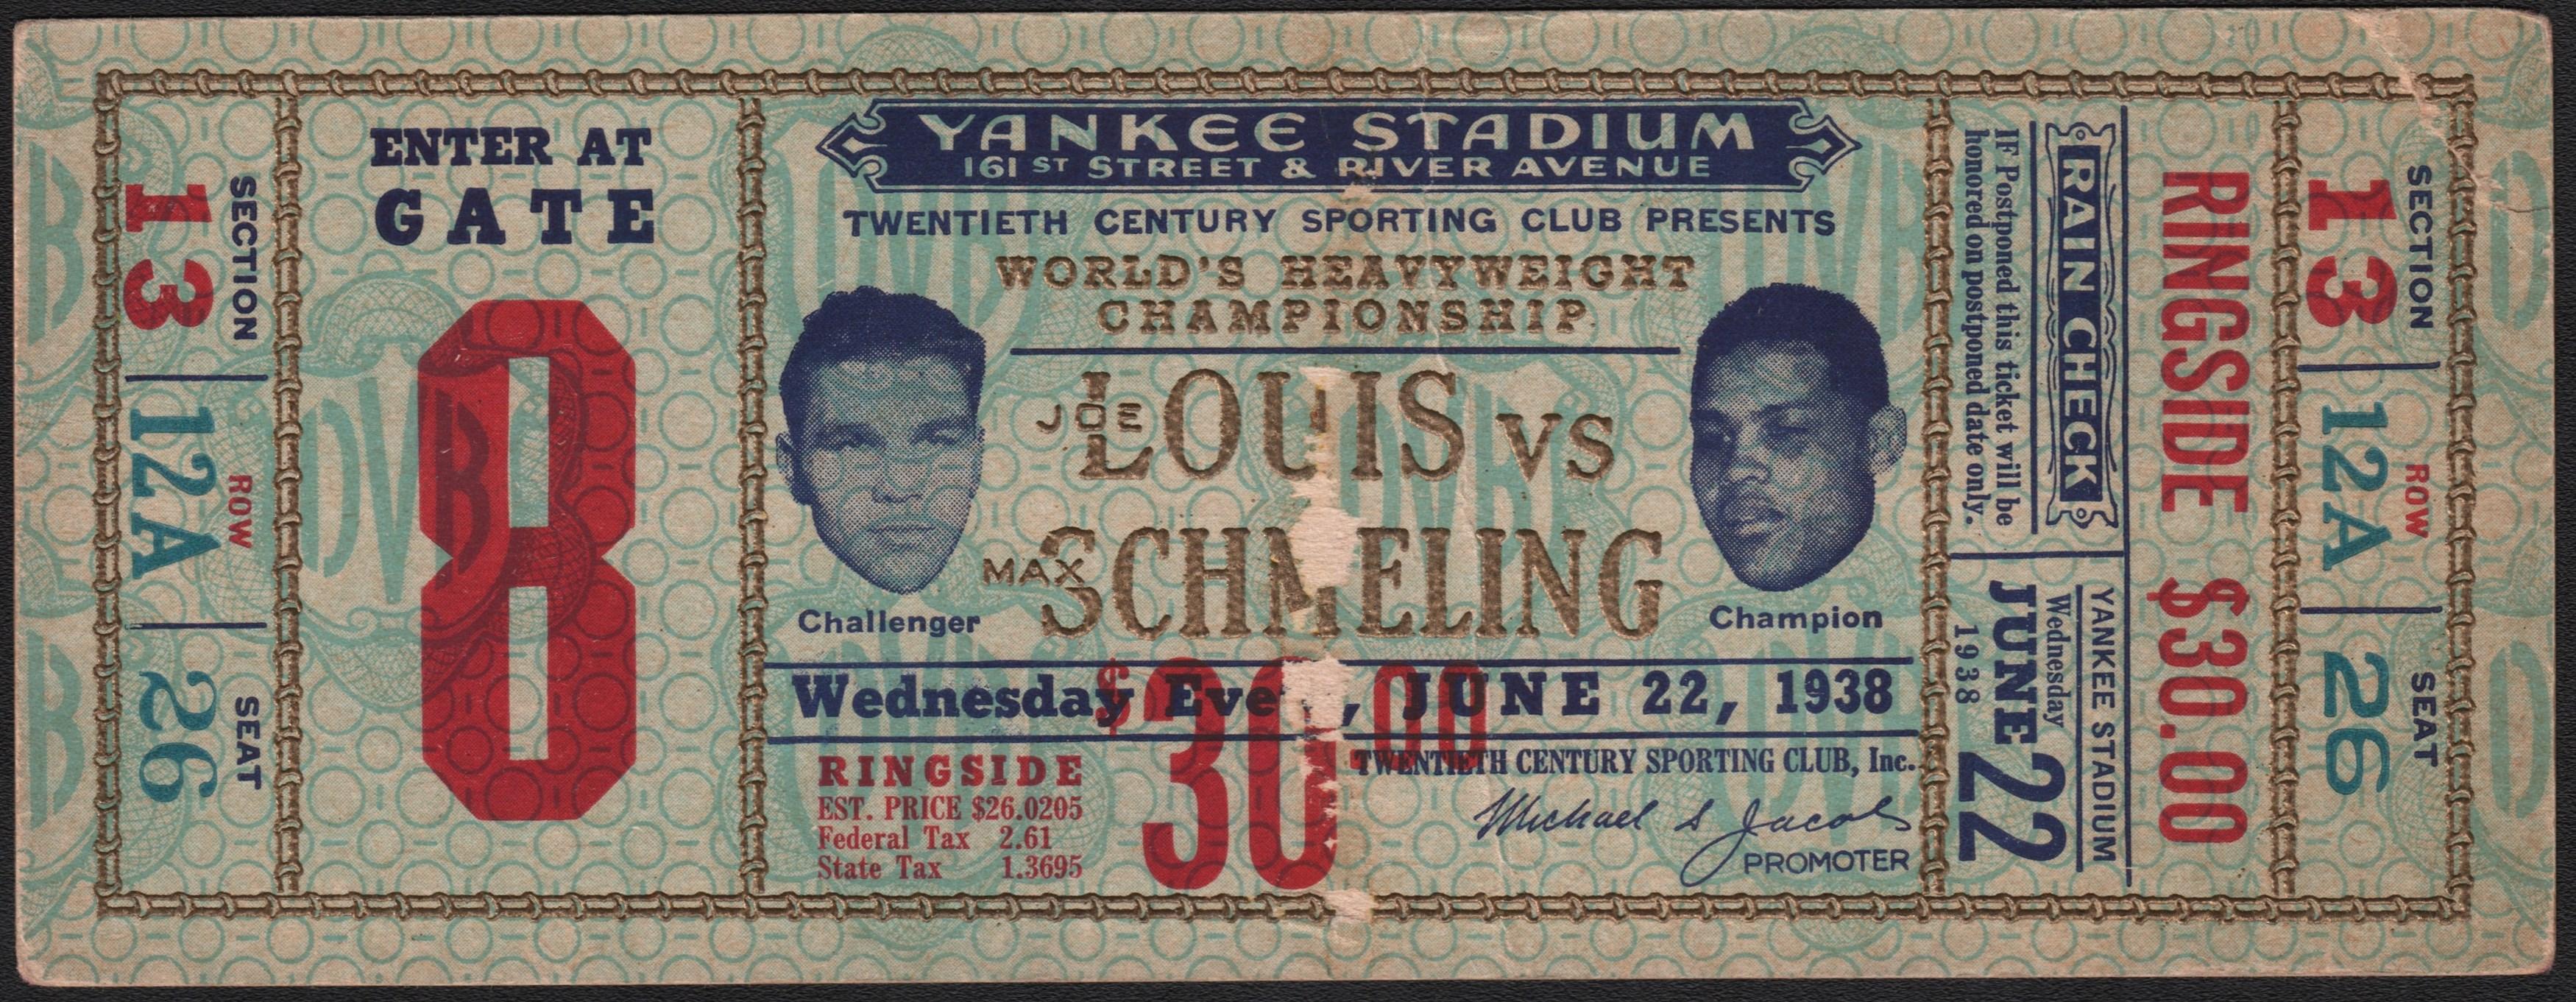 Muhammad Ali & Boxing - Monthly 01-18